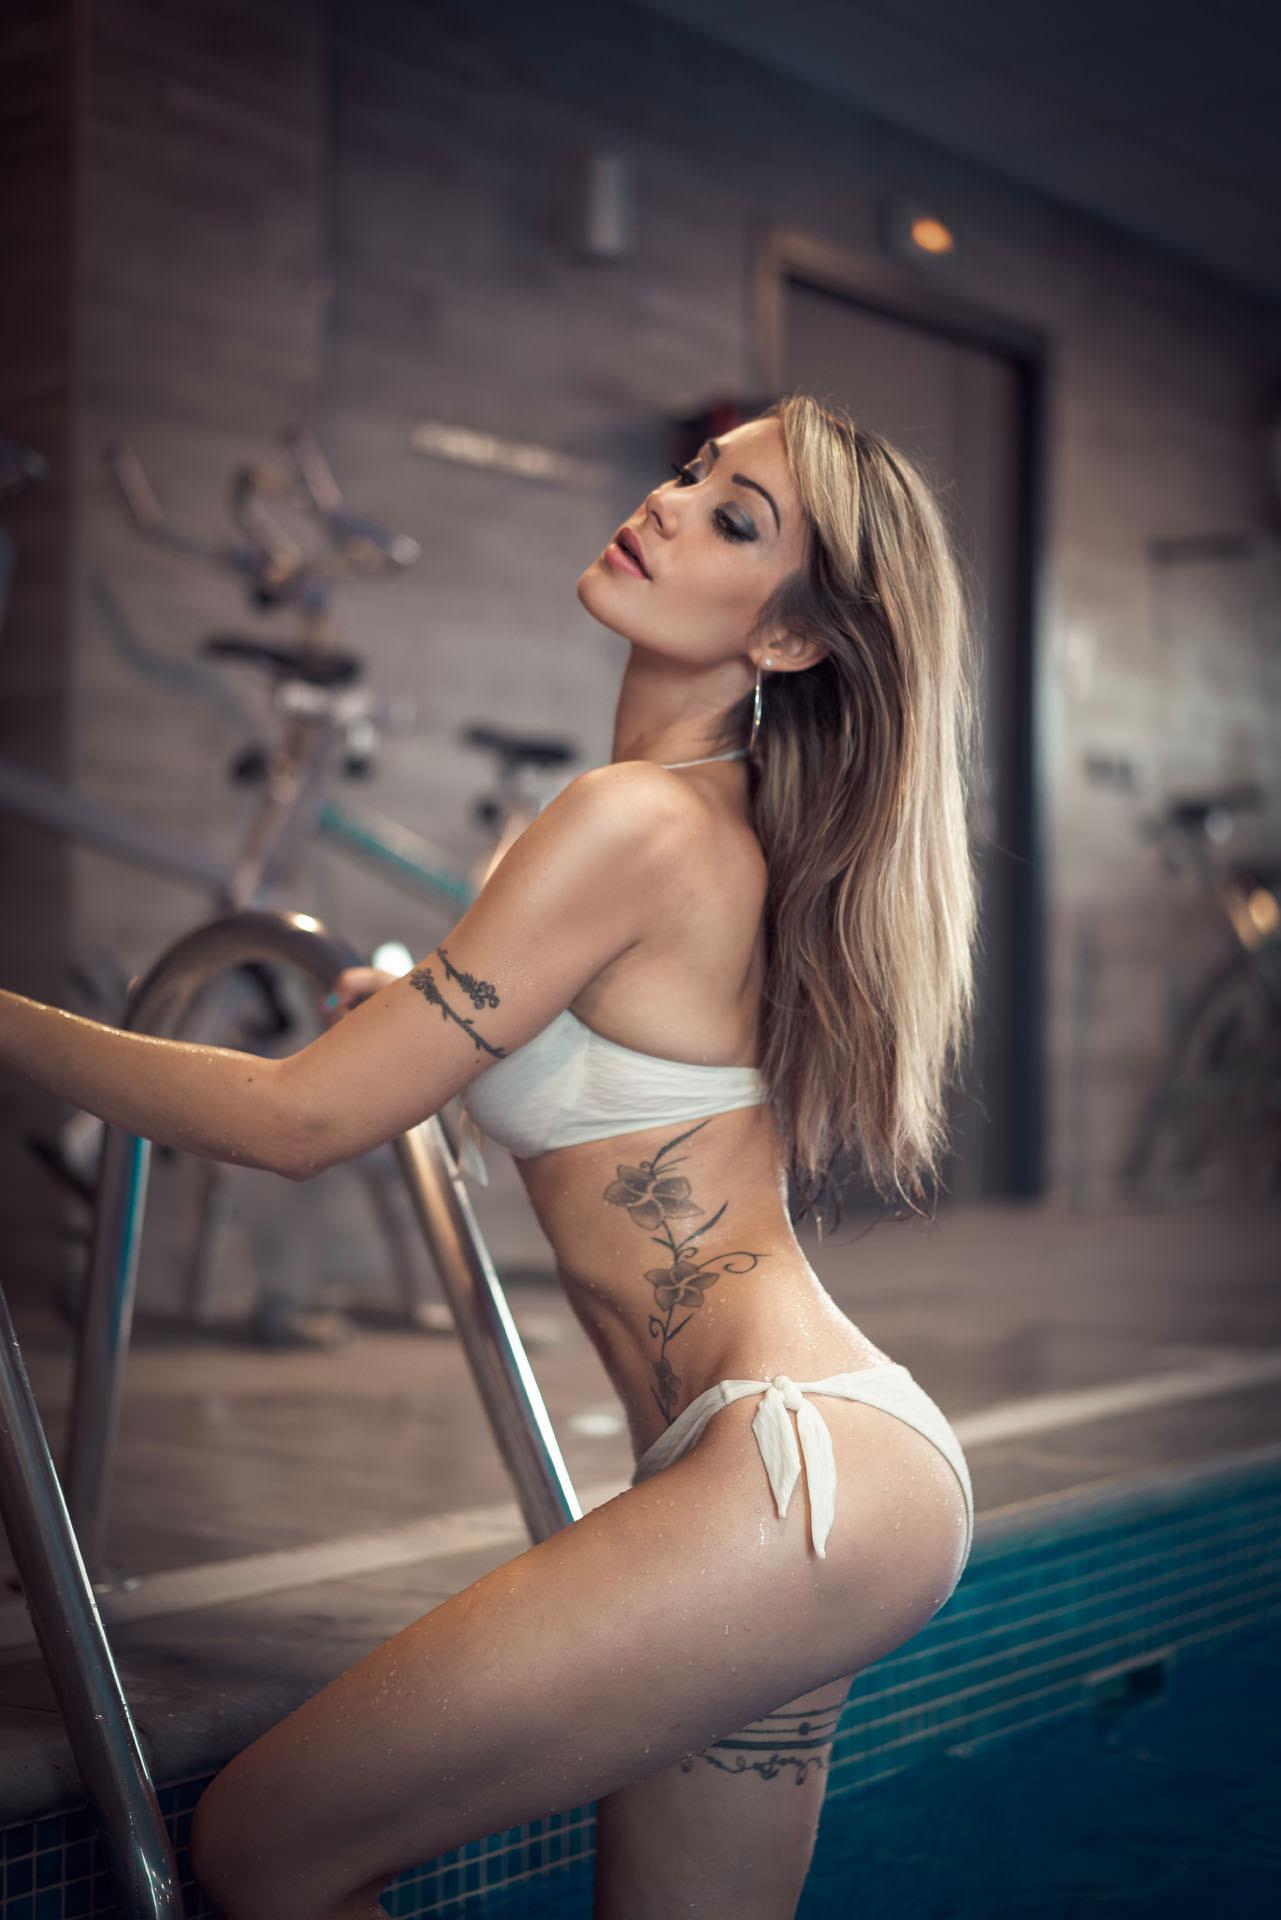 2019-10-15 - Aurélie - Aqua Loft - 03350 - 1920px